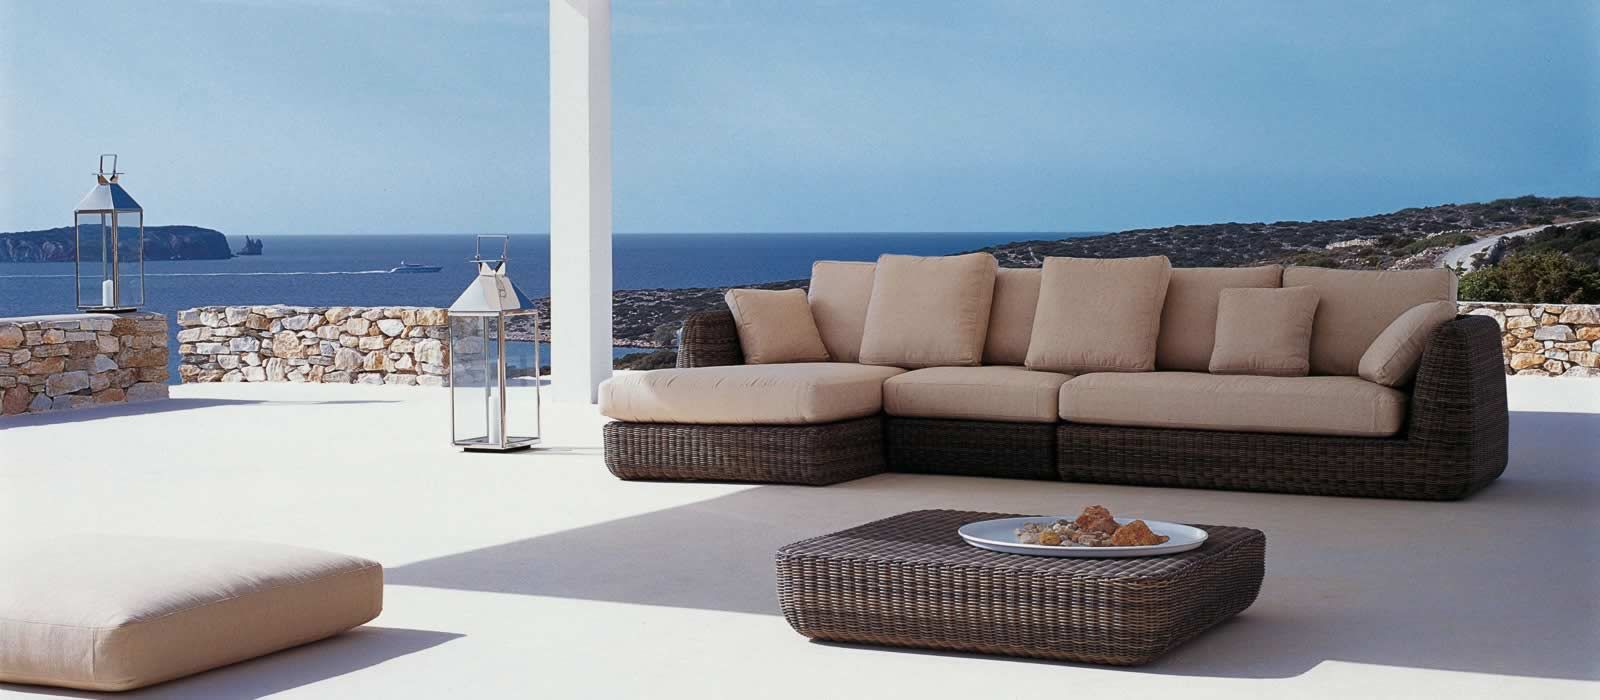 agor mobilier de jardin unopiu - Sofas De Jardin Baratos